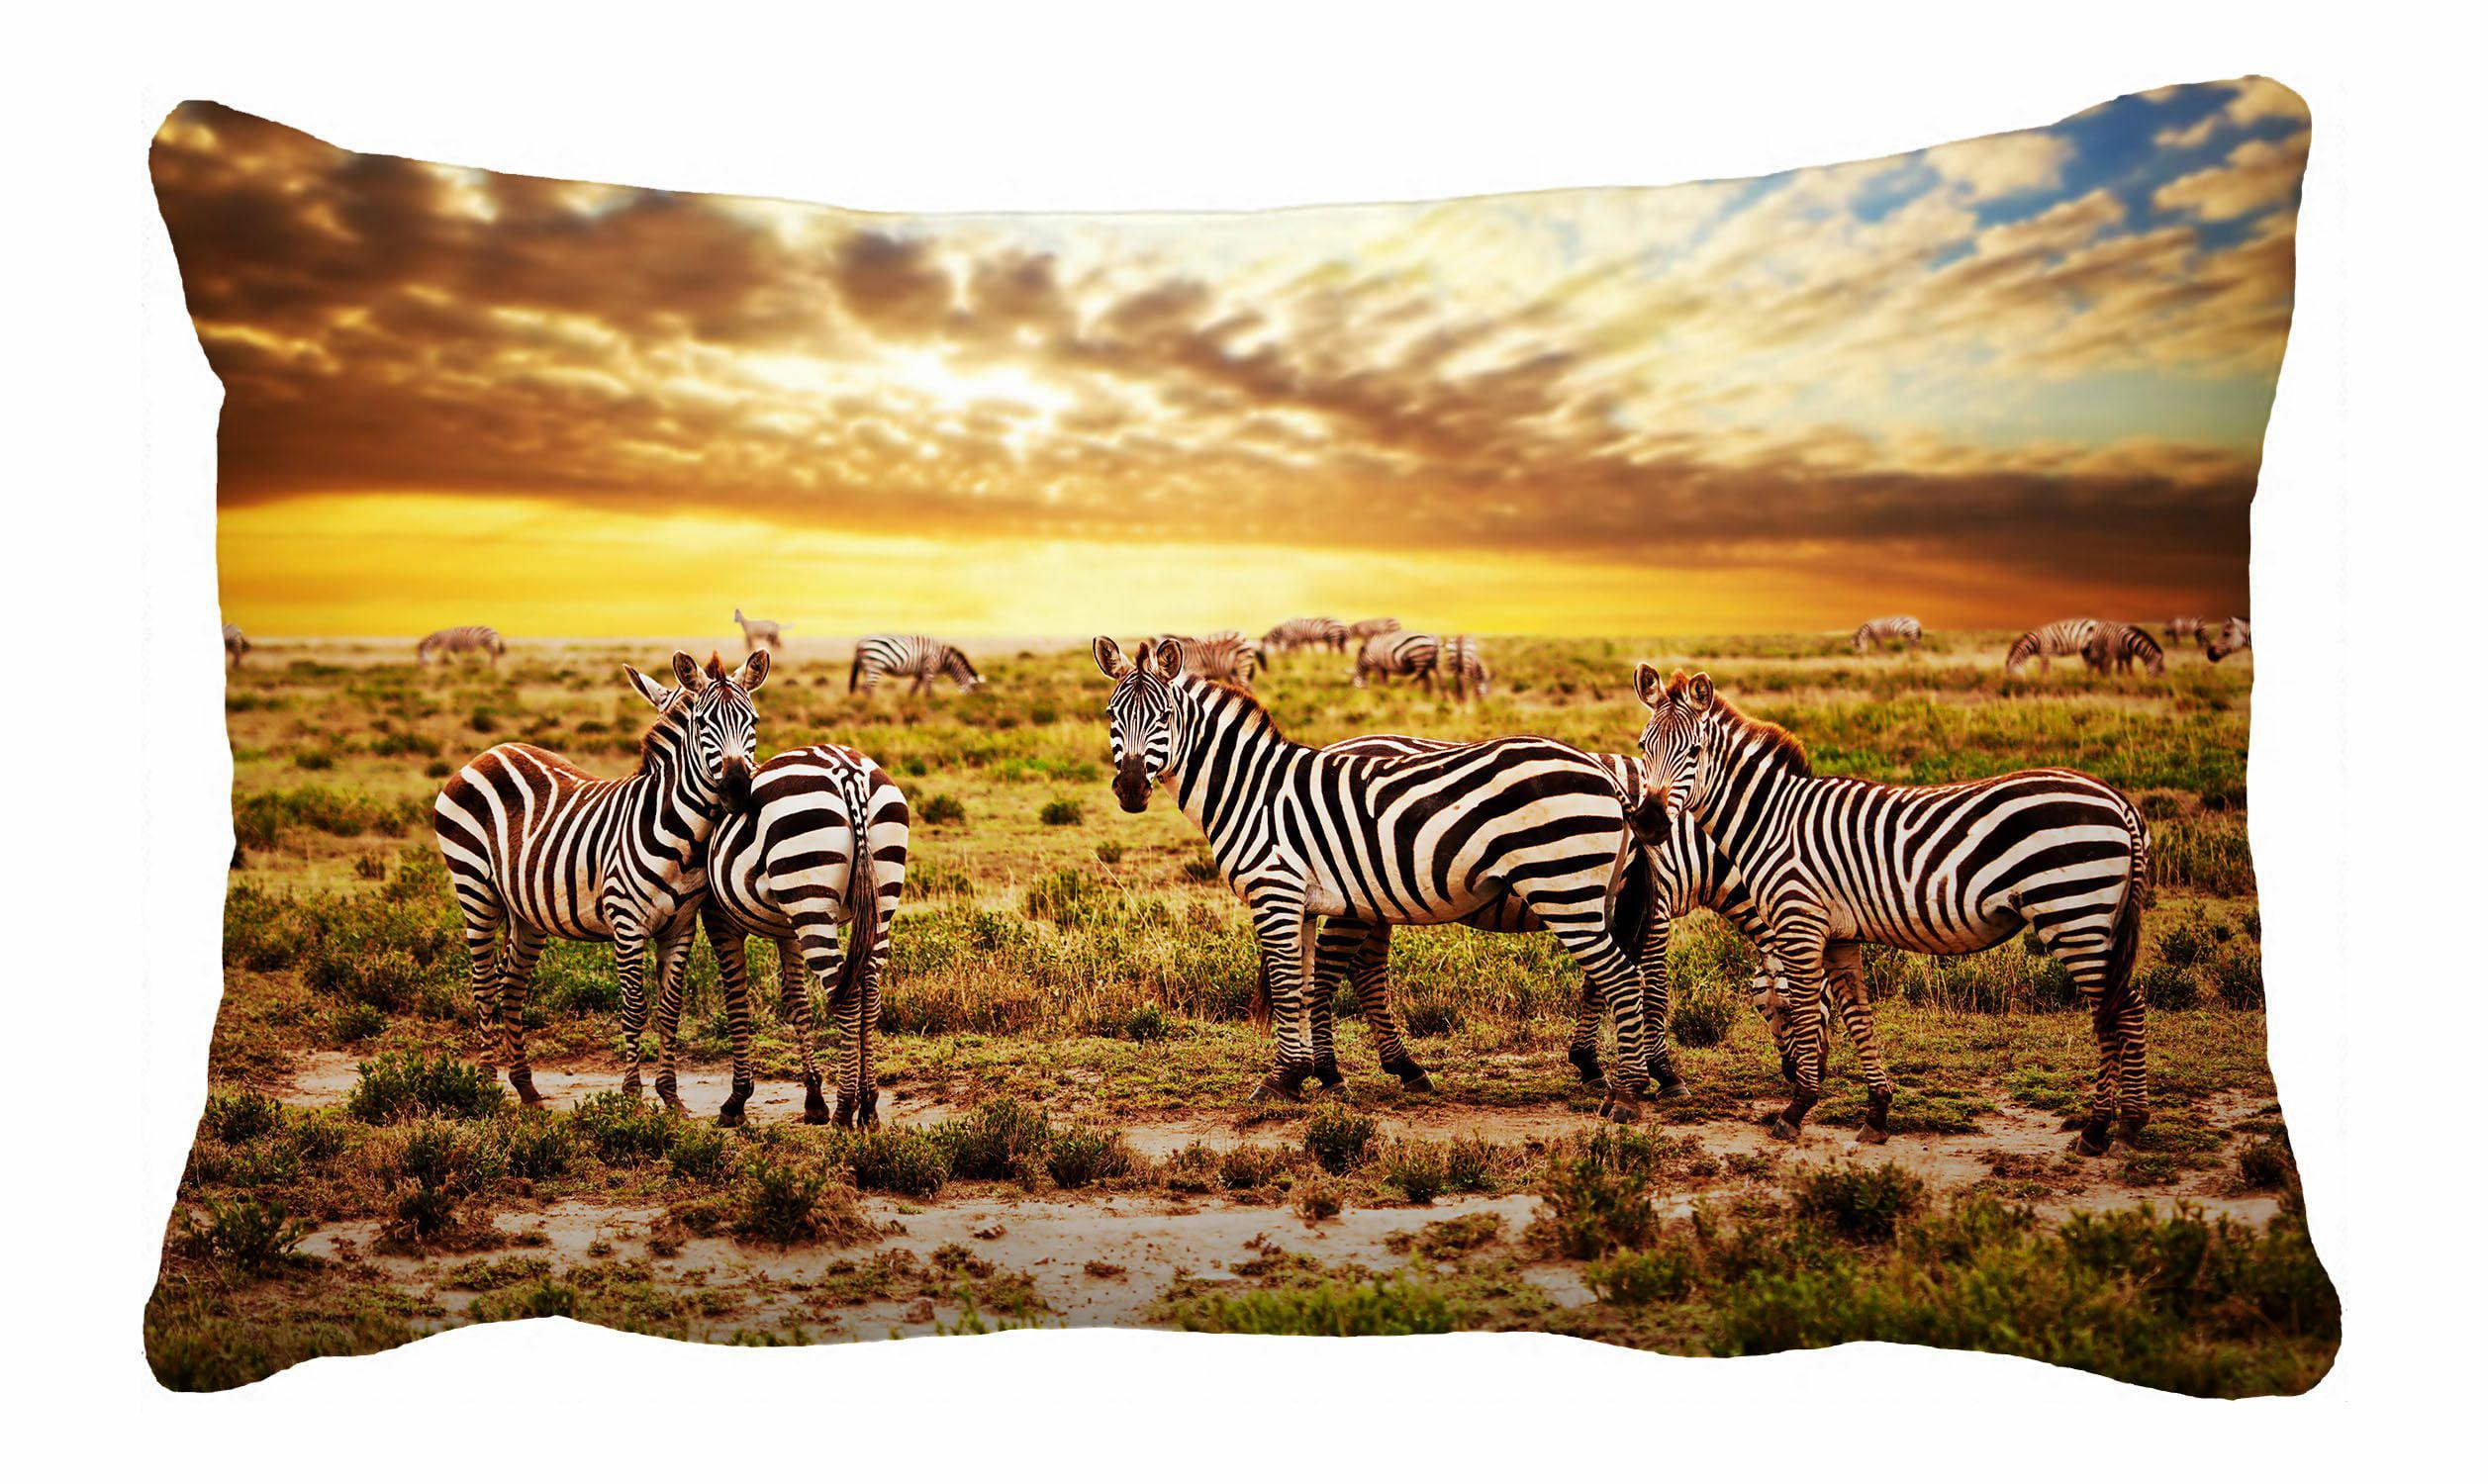 Phfzk Beautiful Sky Cloud Pillow Case Safari Zebras Herd On Savanna At Sunset Africa Pillowcase Throw Pillow Cushion Cover Two Sides Size 20x30 Inches Walmart Com Walmart Com